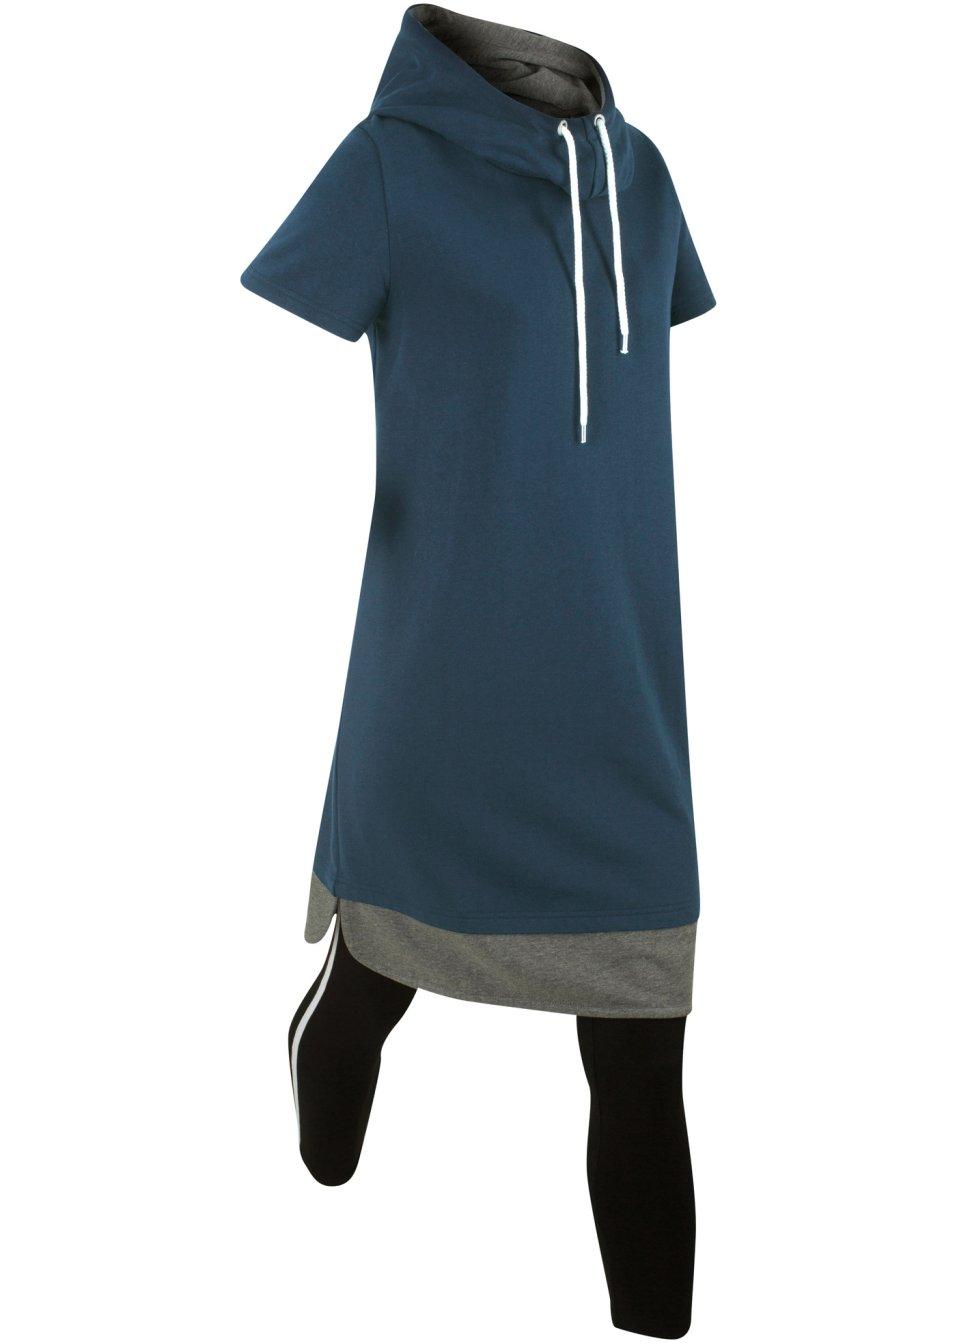 legeres kleid mit passender leggings dunkelblau. Black Bedroom Furniture Sets. Home Design Ideas